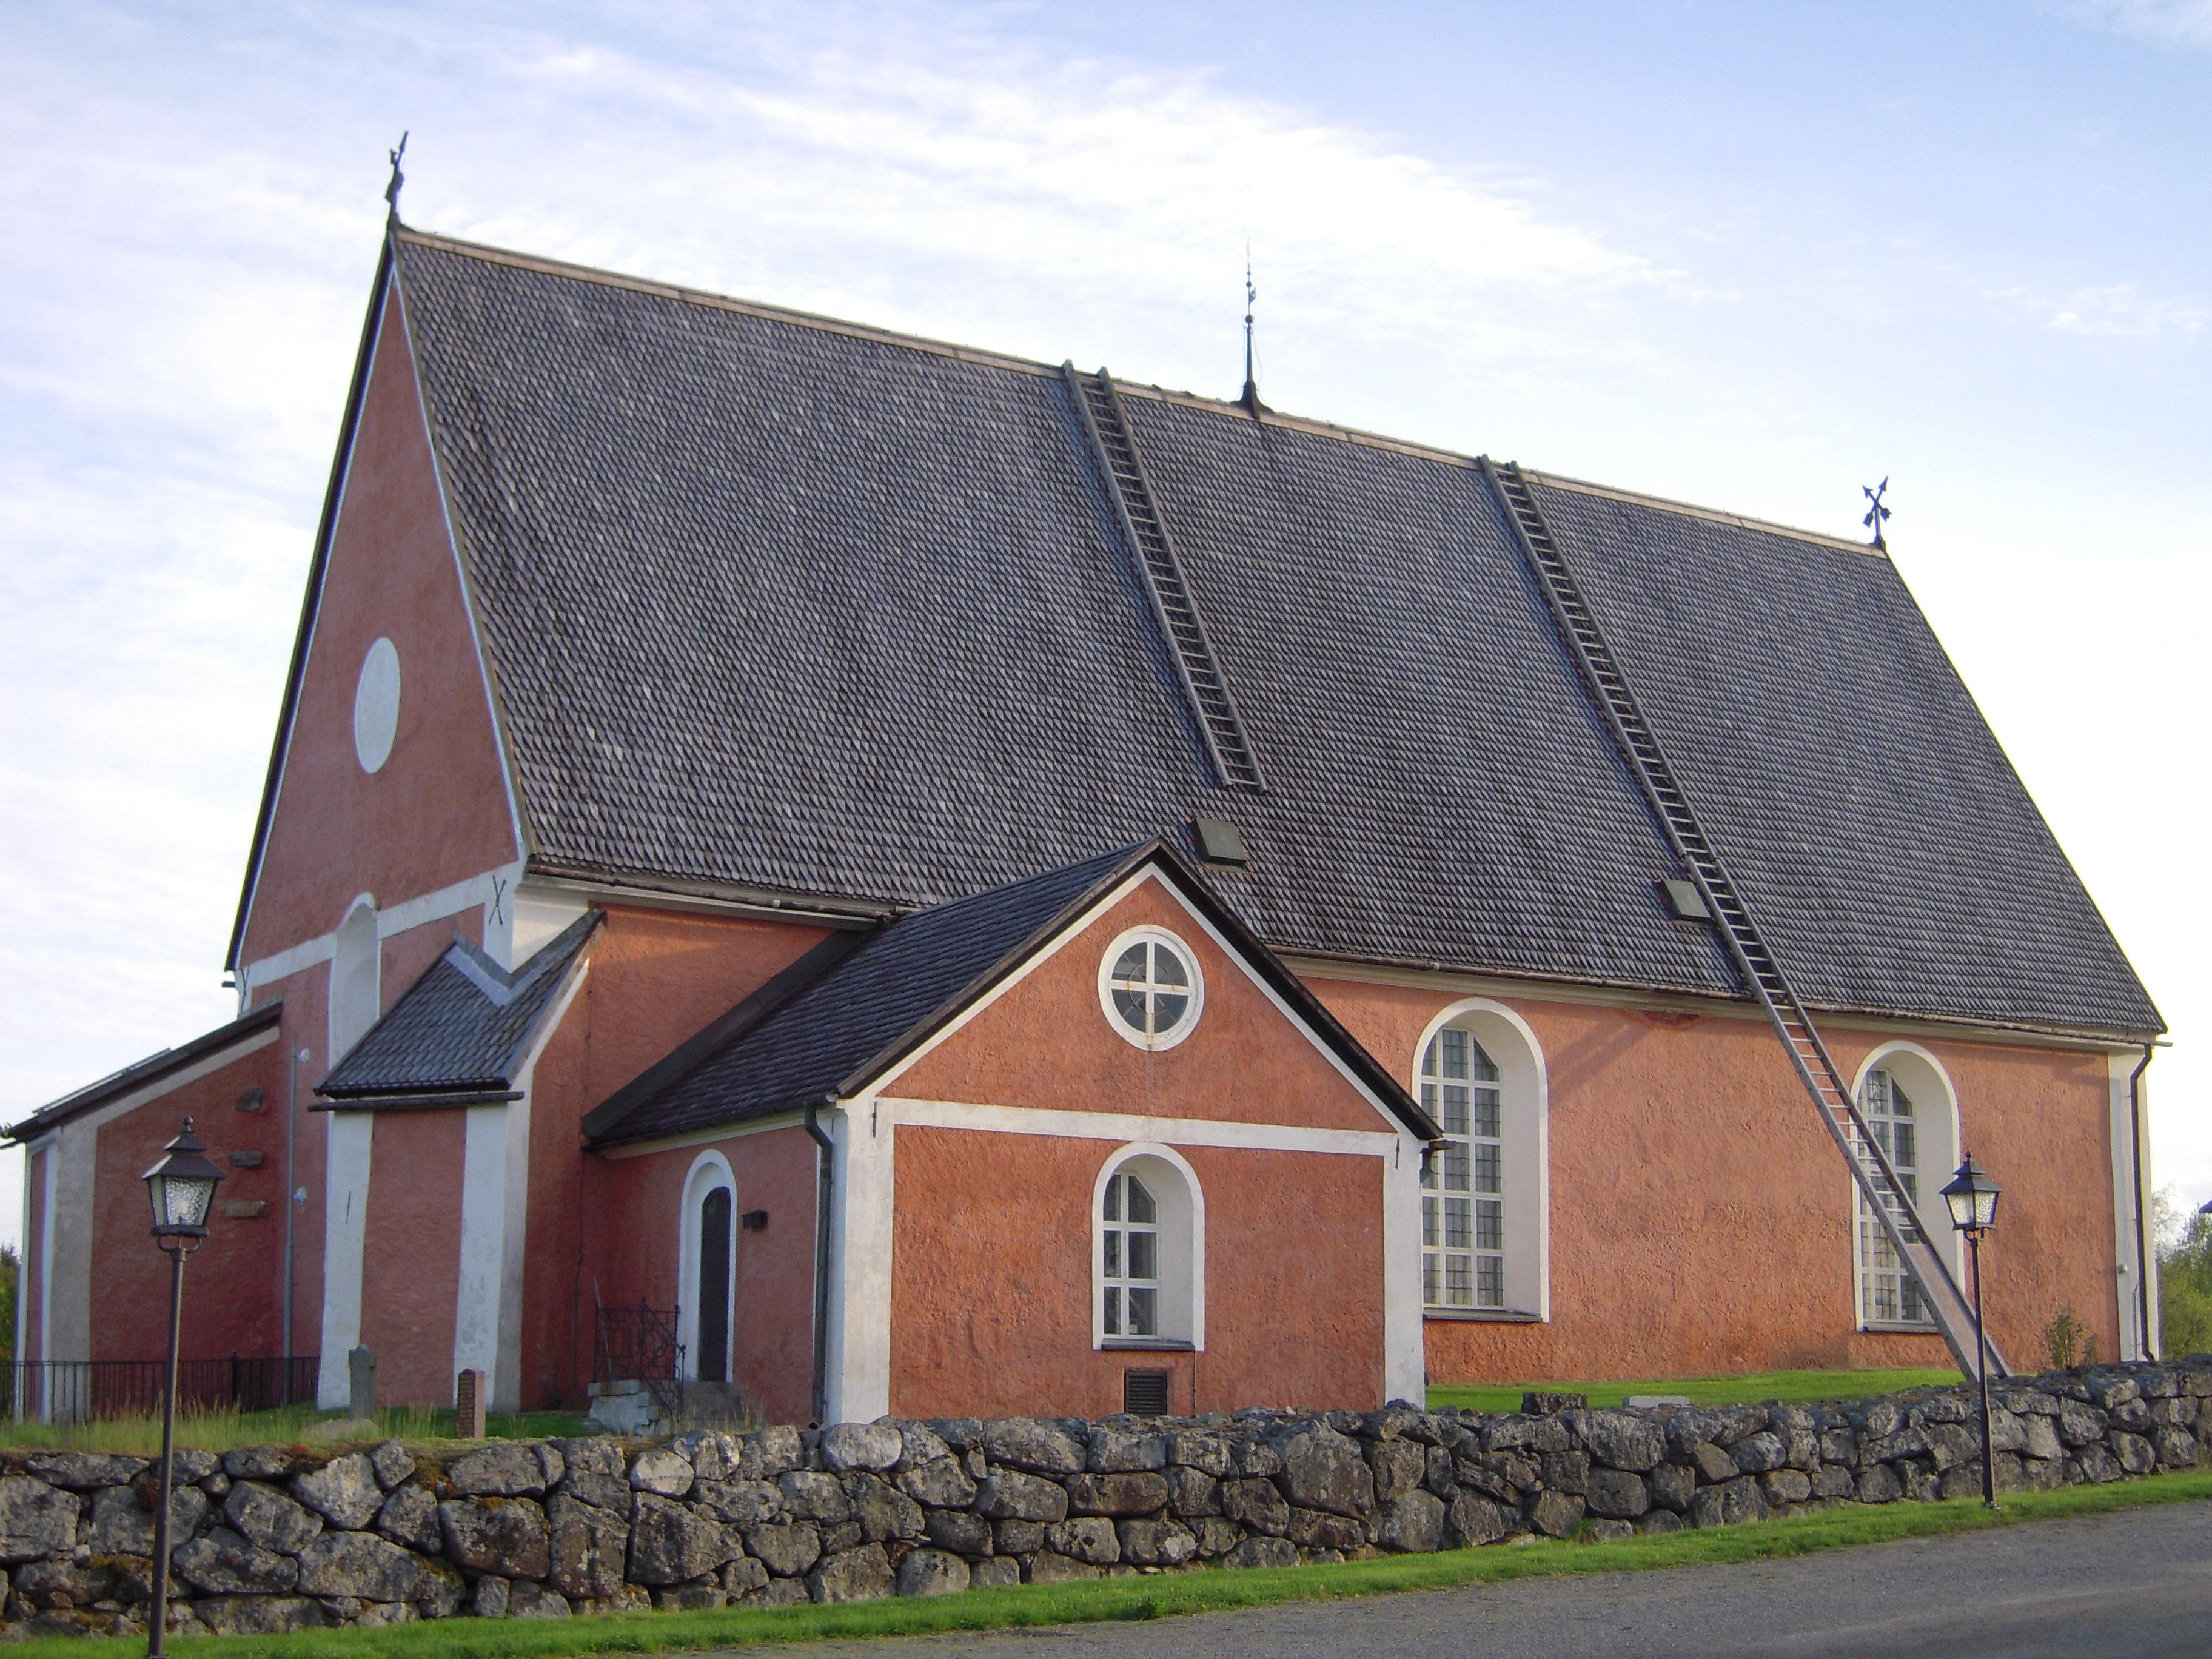 Bygdeå Church, Västerbotten, Sweden | Bygdeå church from … | Flickr